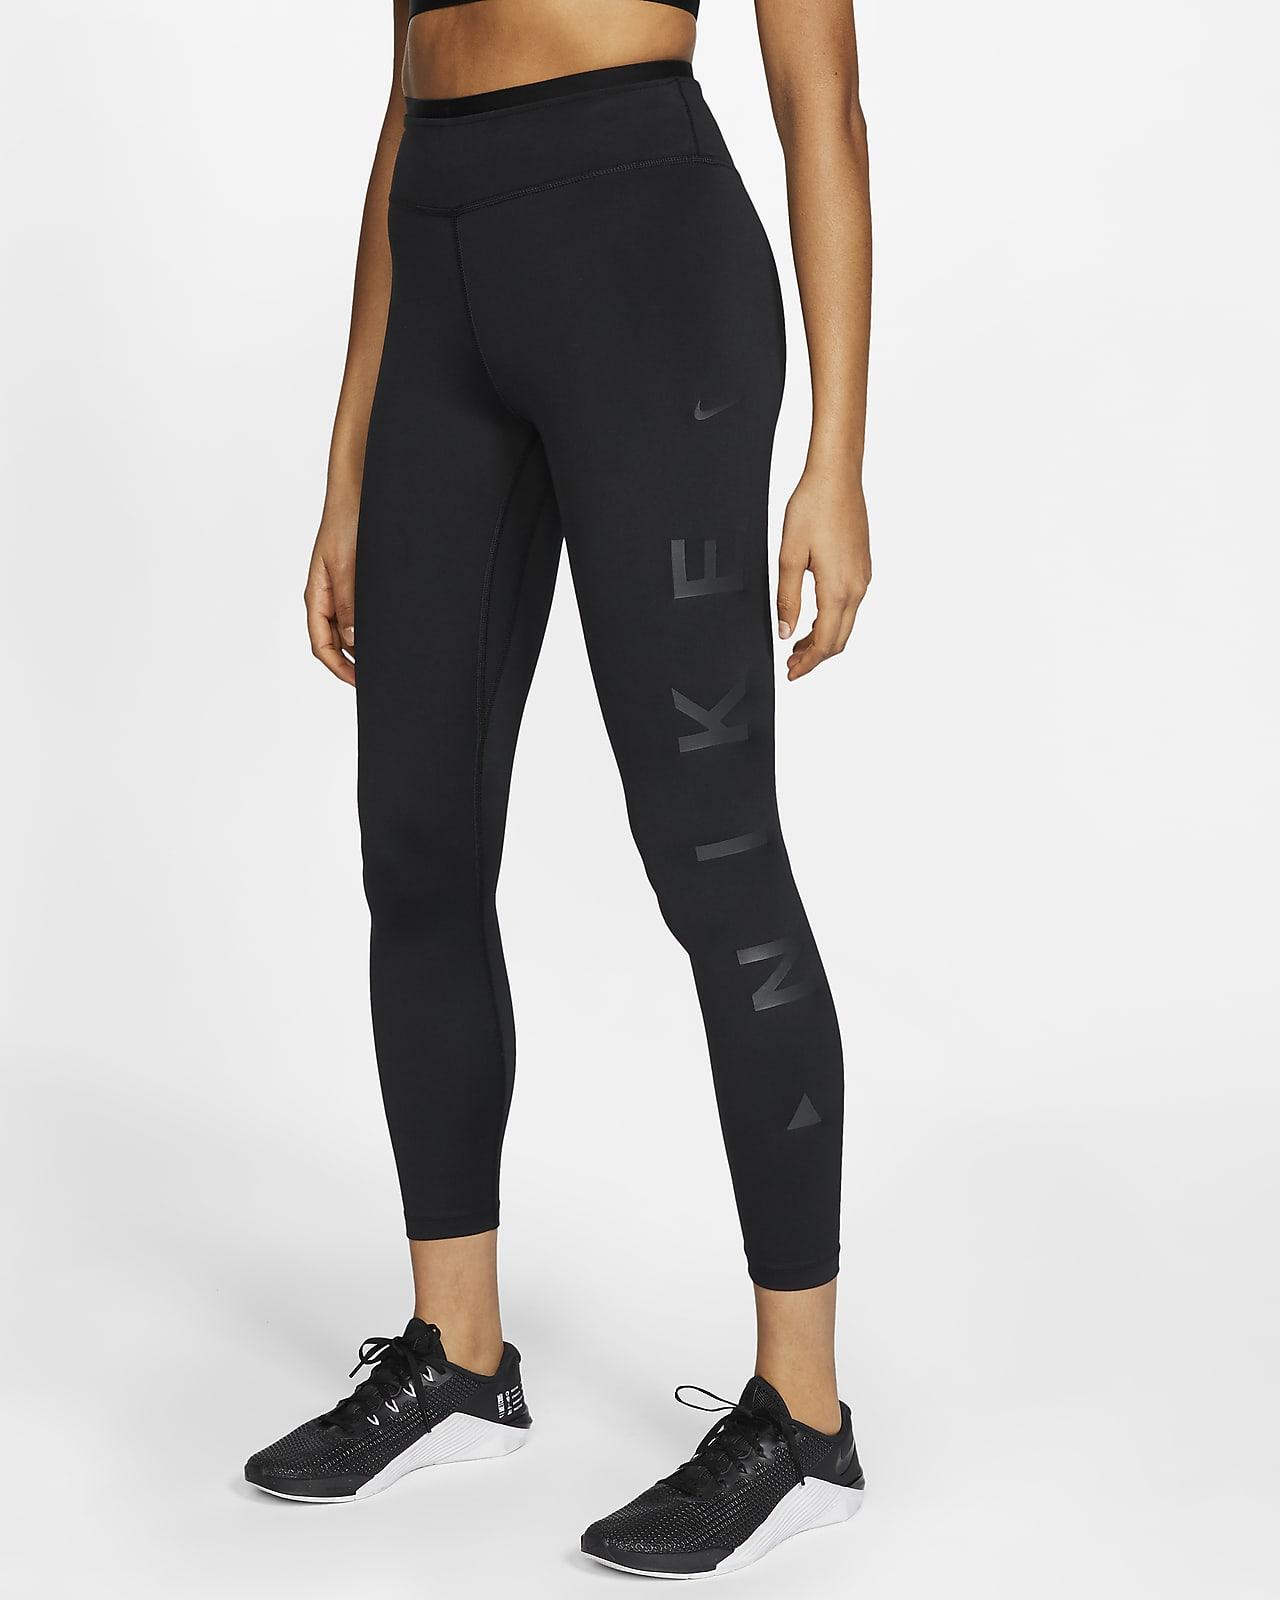 Nike One Icon Clash Women's Graphic 7/8 Leggings